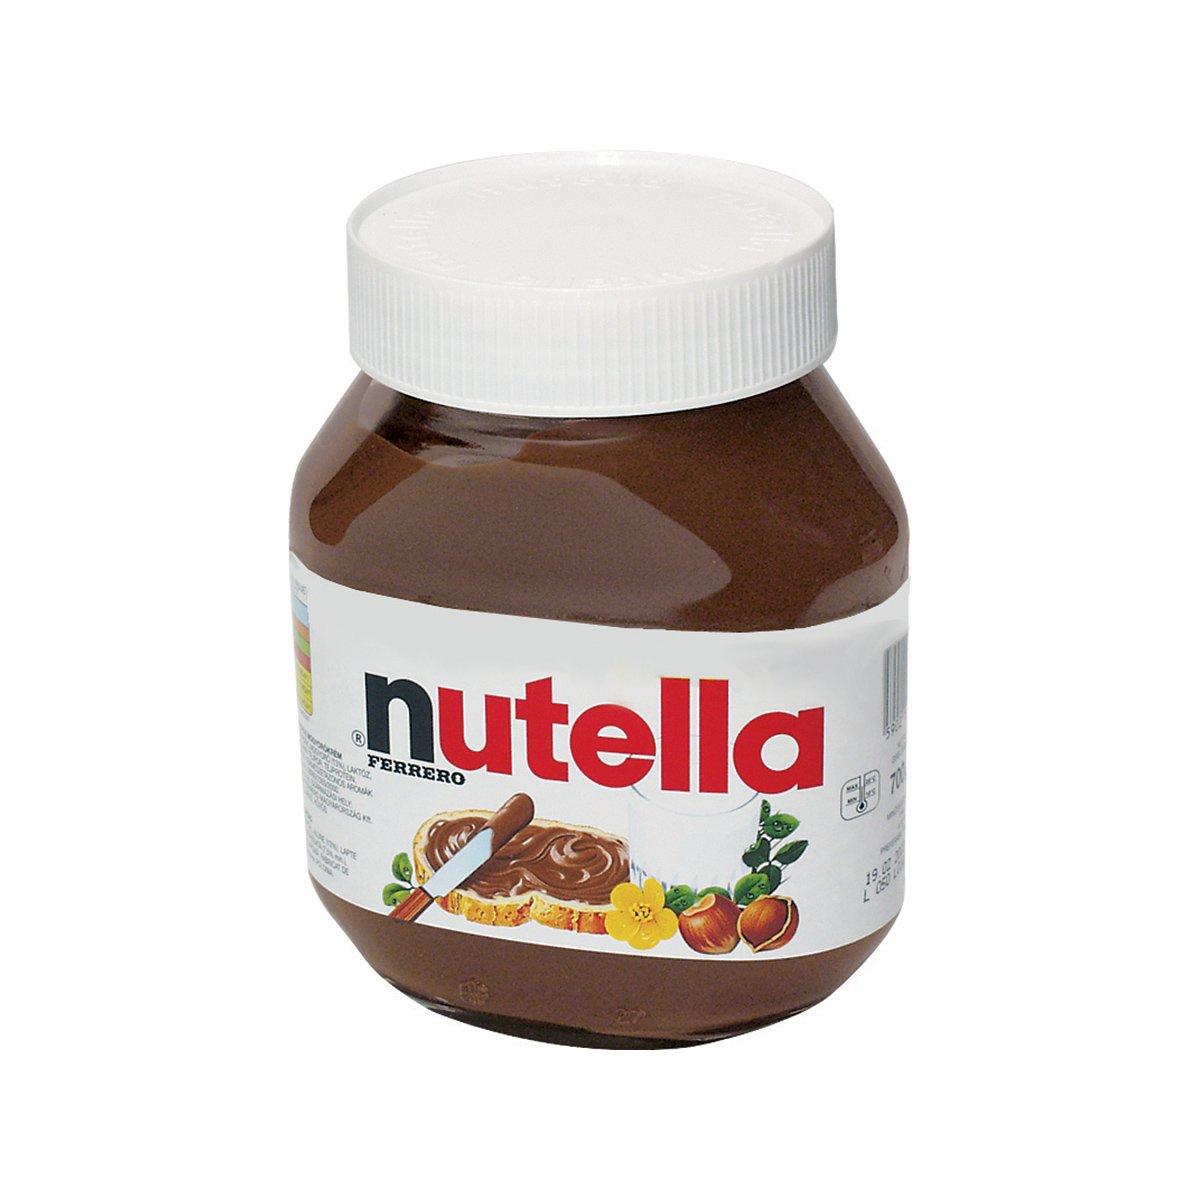 Crema de cacao cu alune Nutella, T750, 750 g imagine